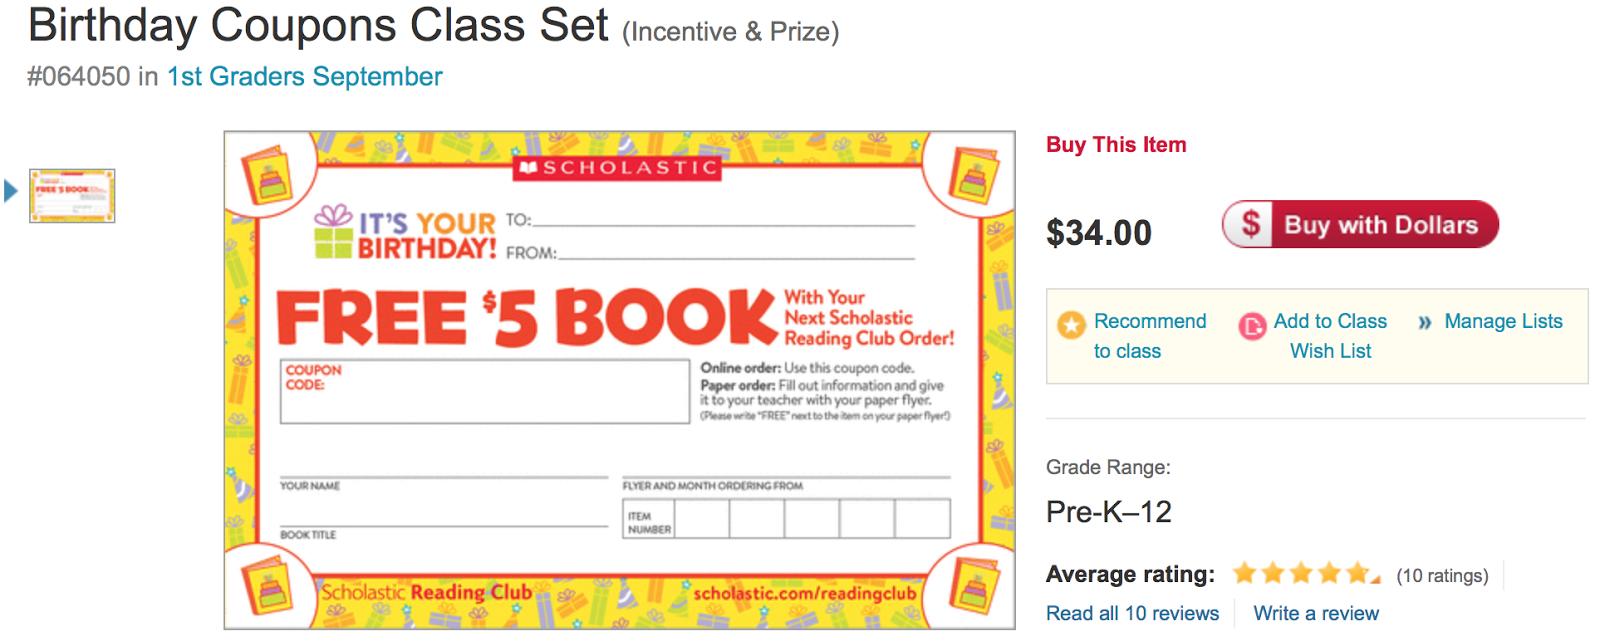 Scholastic Reading Club: Tips & Tricks - The Brown Bag Teacher